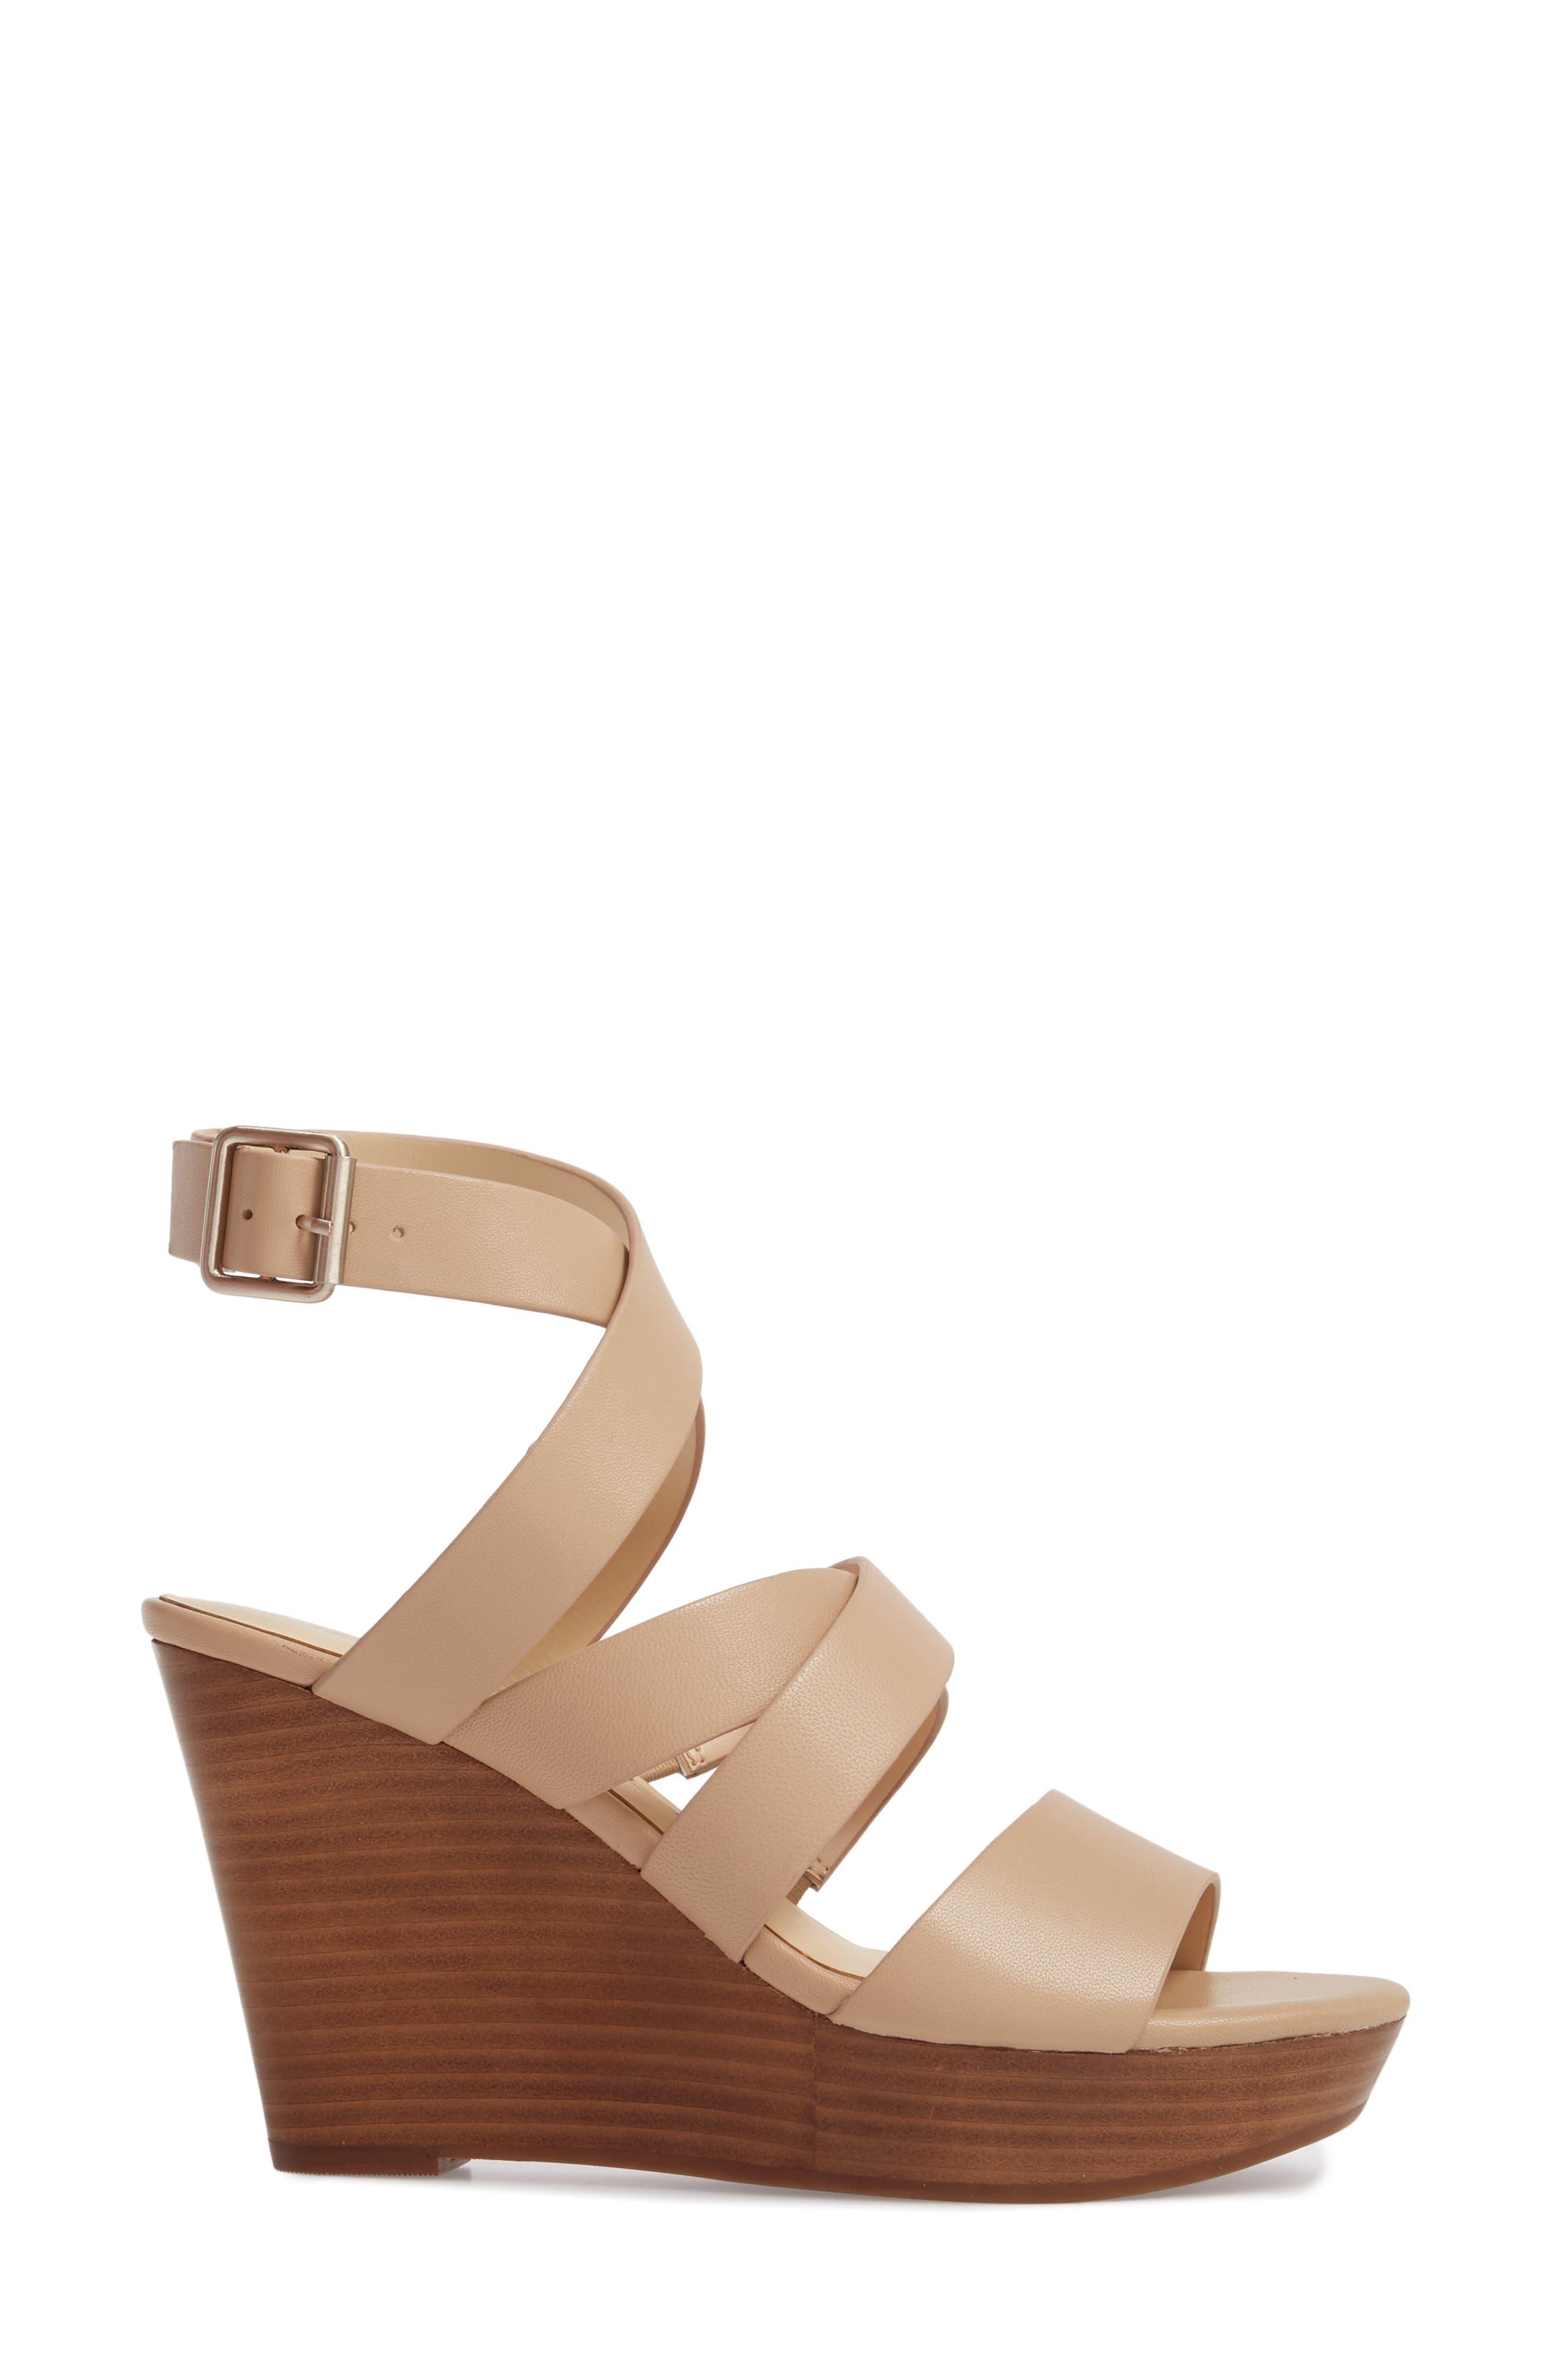 SOLE SOCIETY, Pippy Platform Sandal, Alternate thumbnail 3, color, TAN